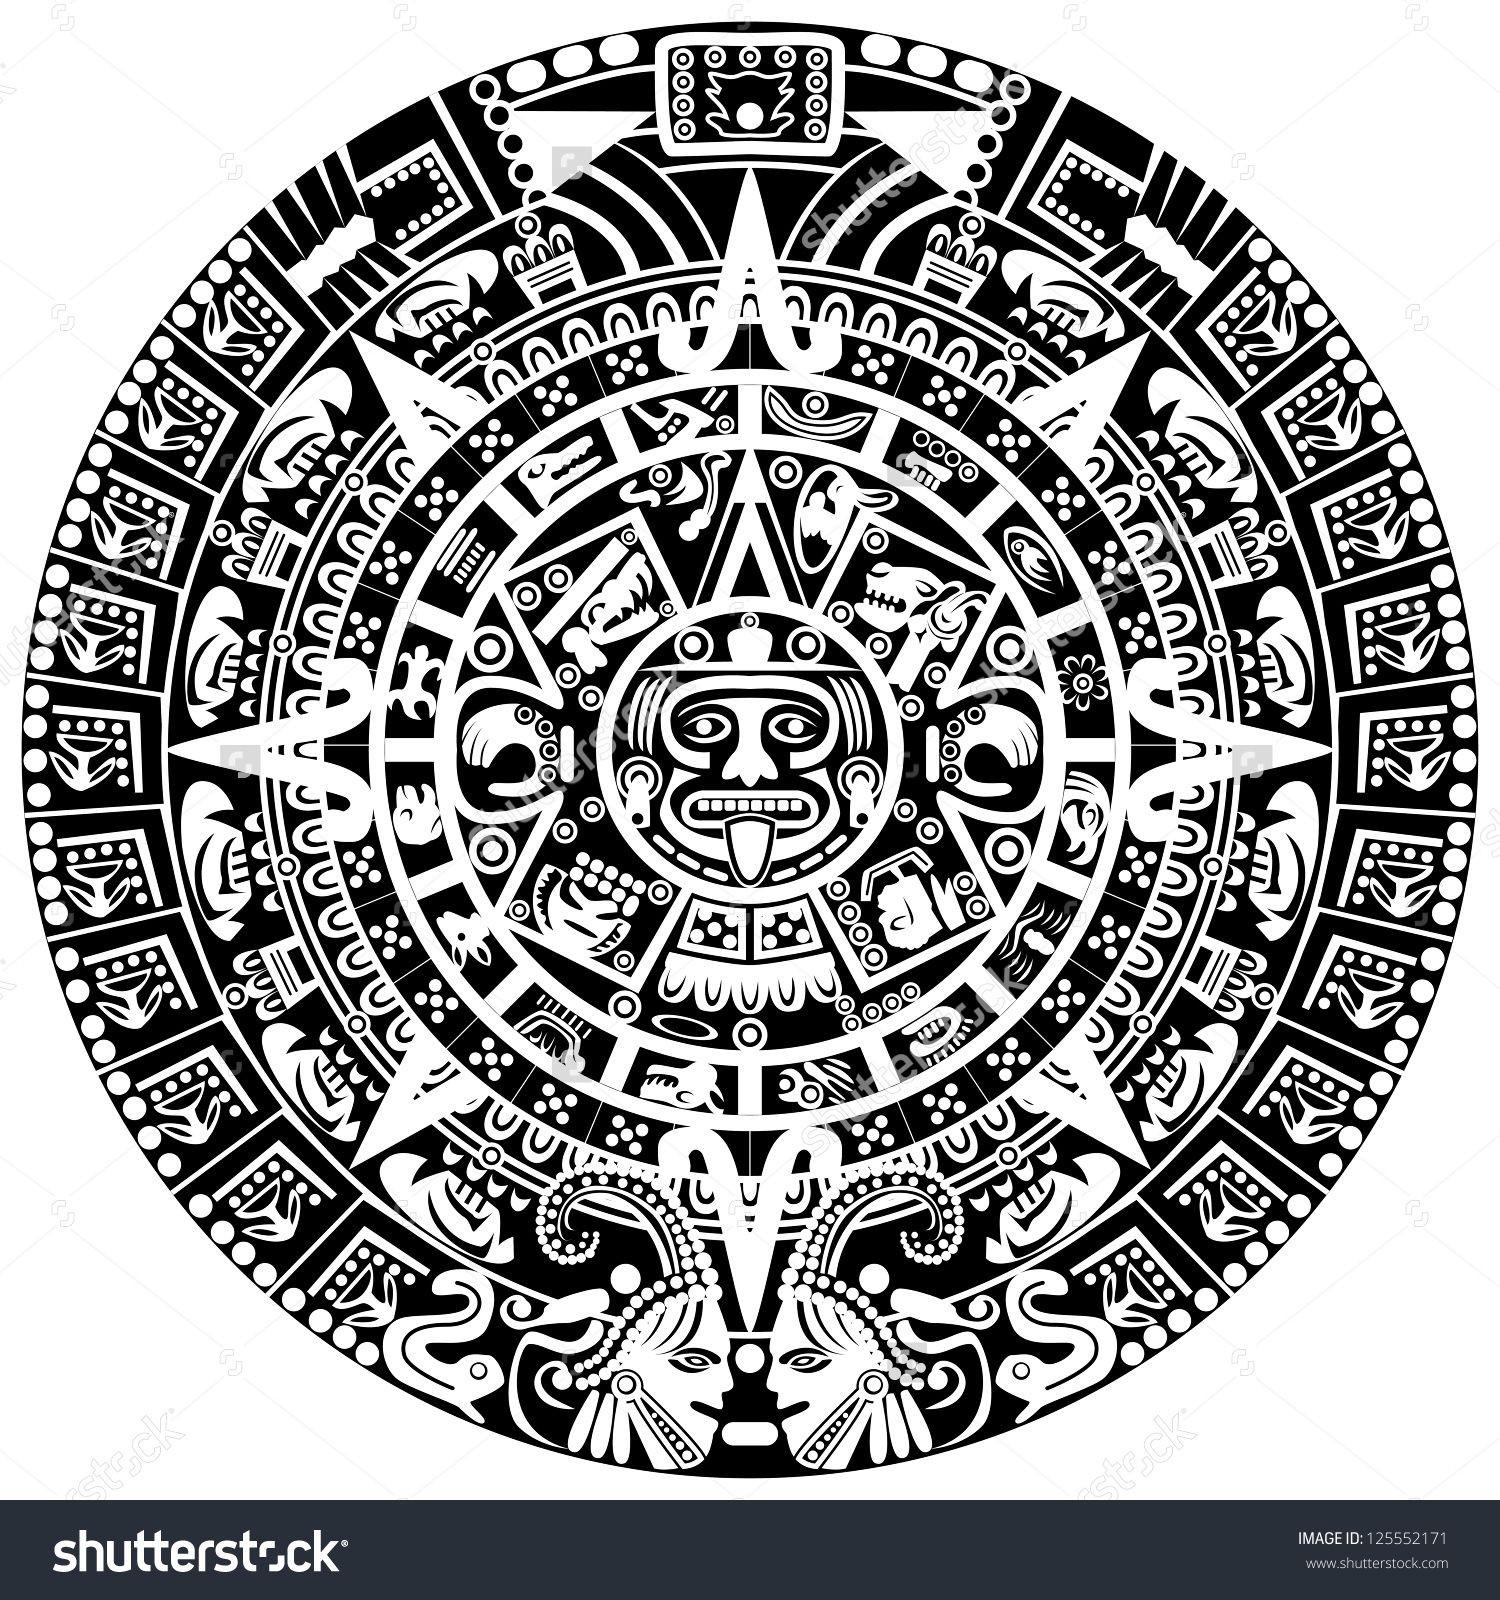 Template Tribal Aztec Calendar Skull Background Printed For No Cost inside Aztec Calendar Printable Template